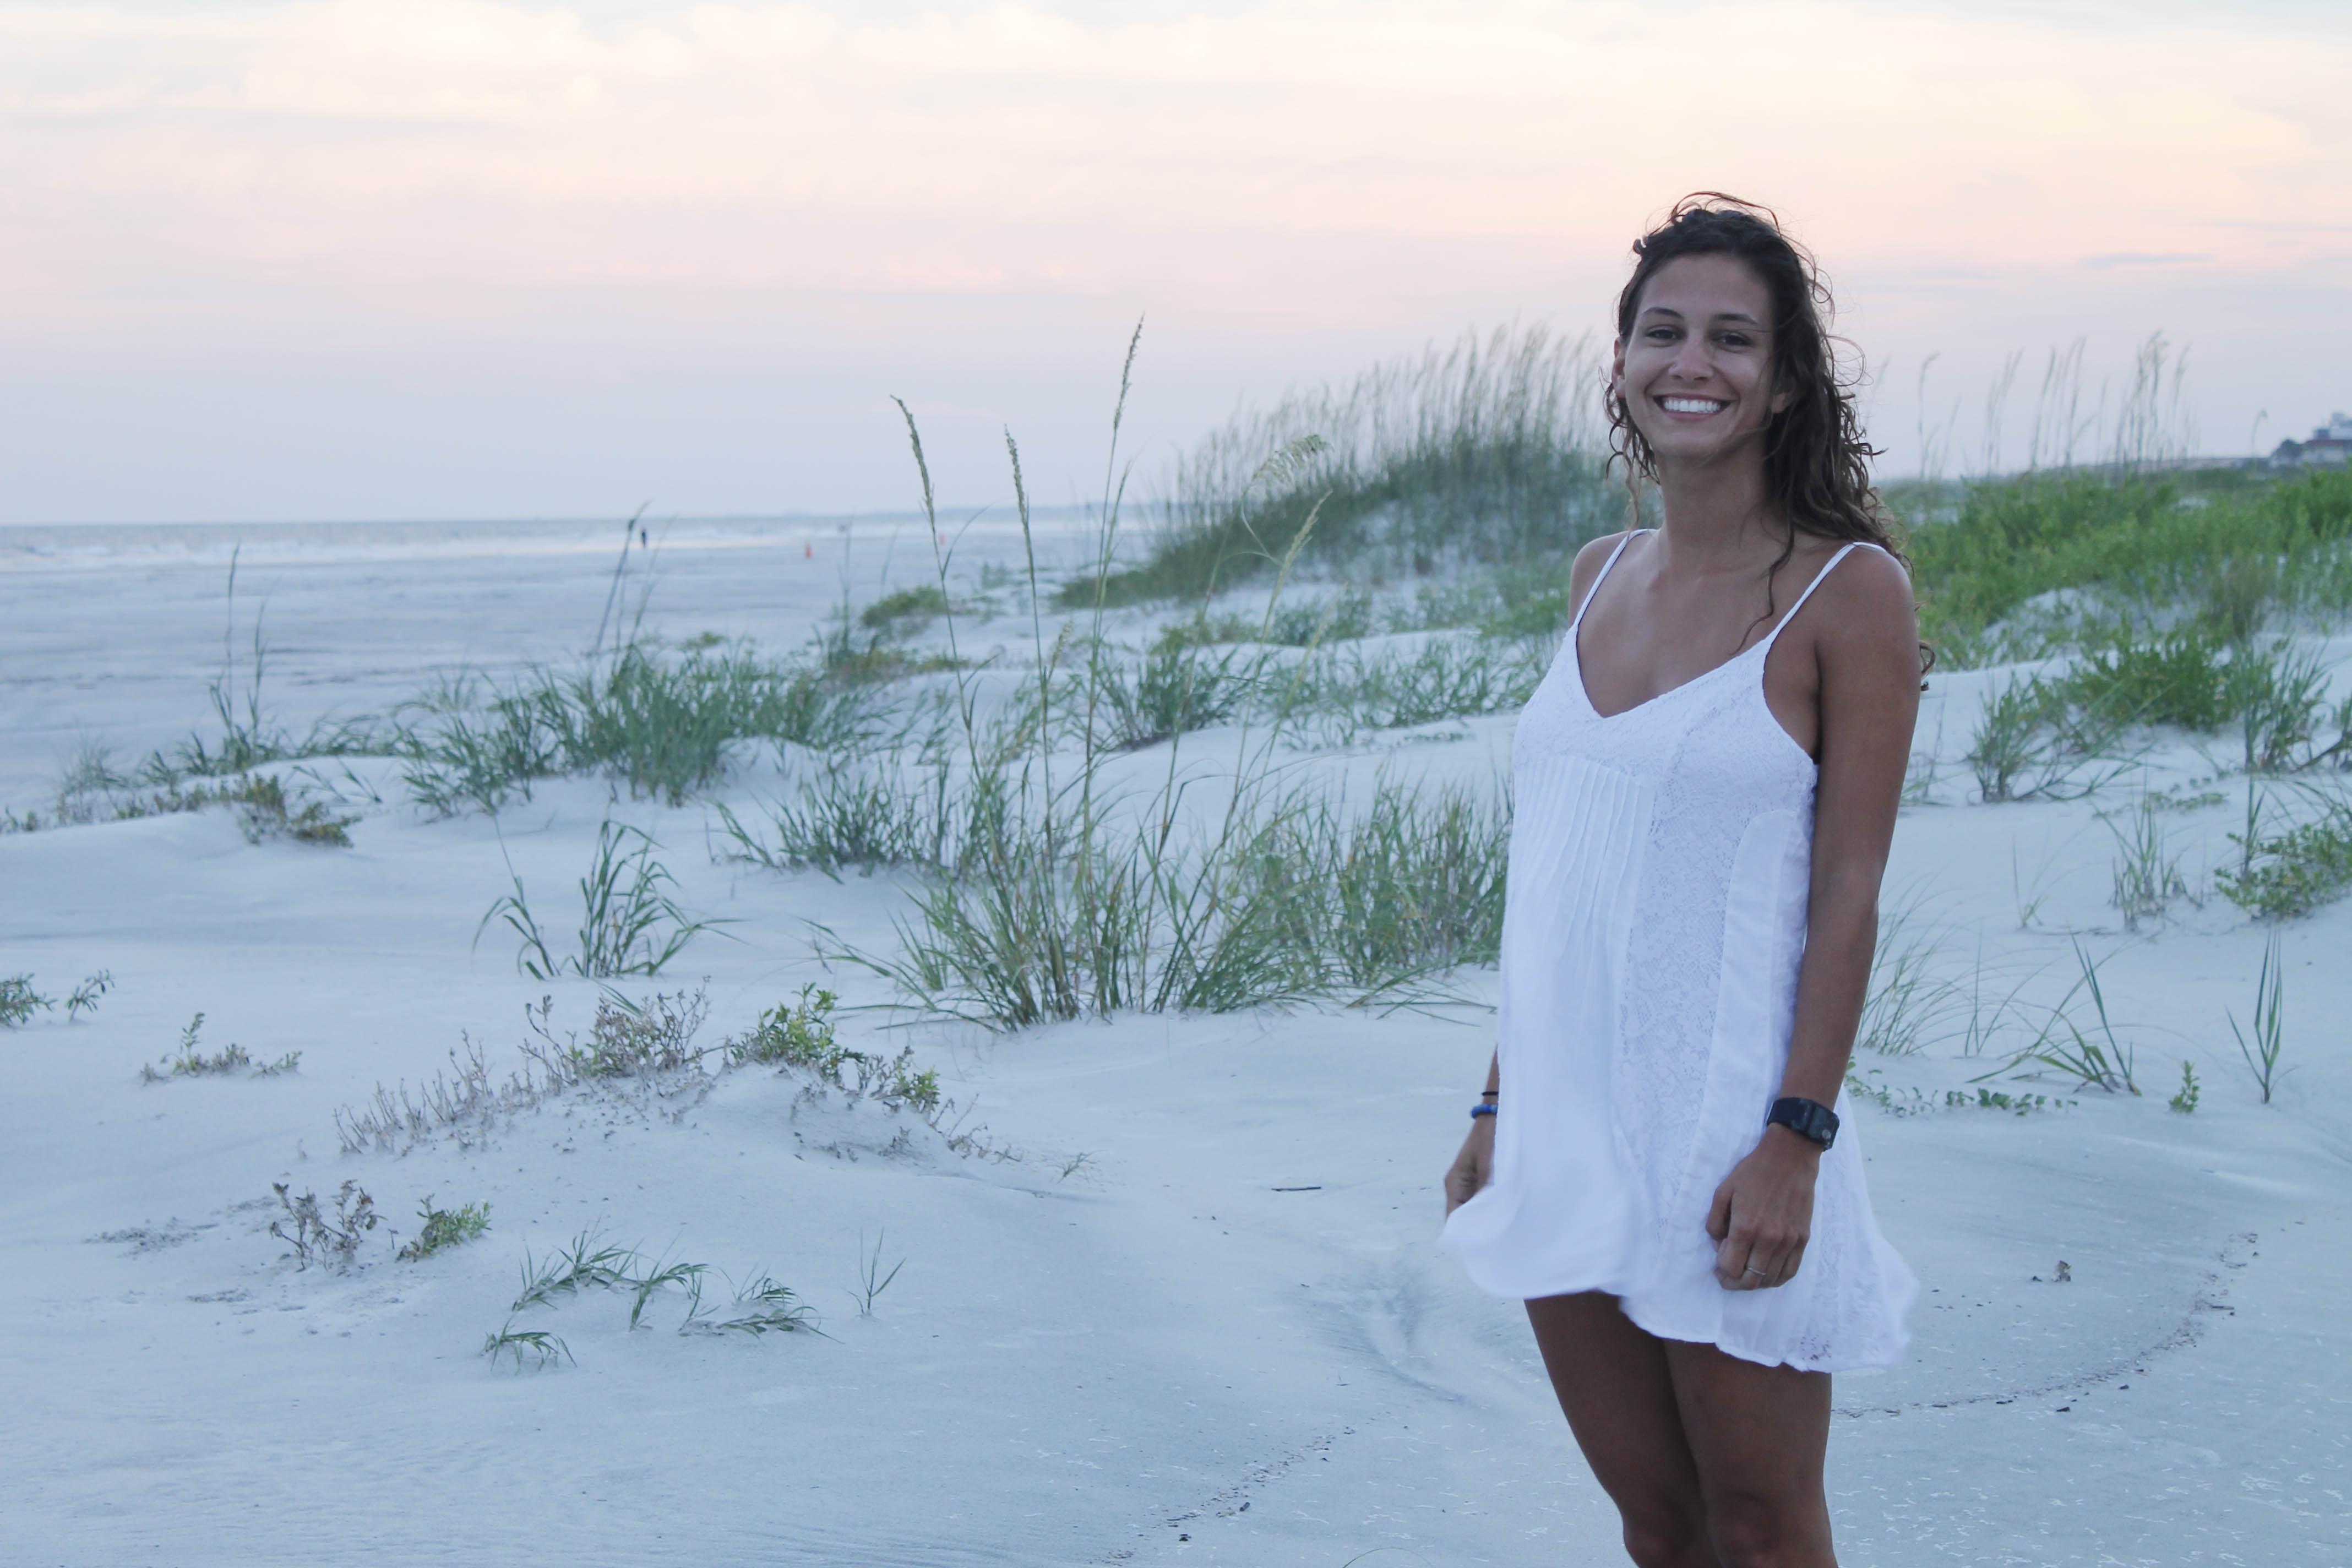 Go to Maddie Zatkulak's profile